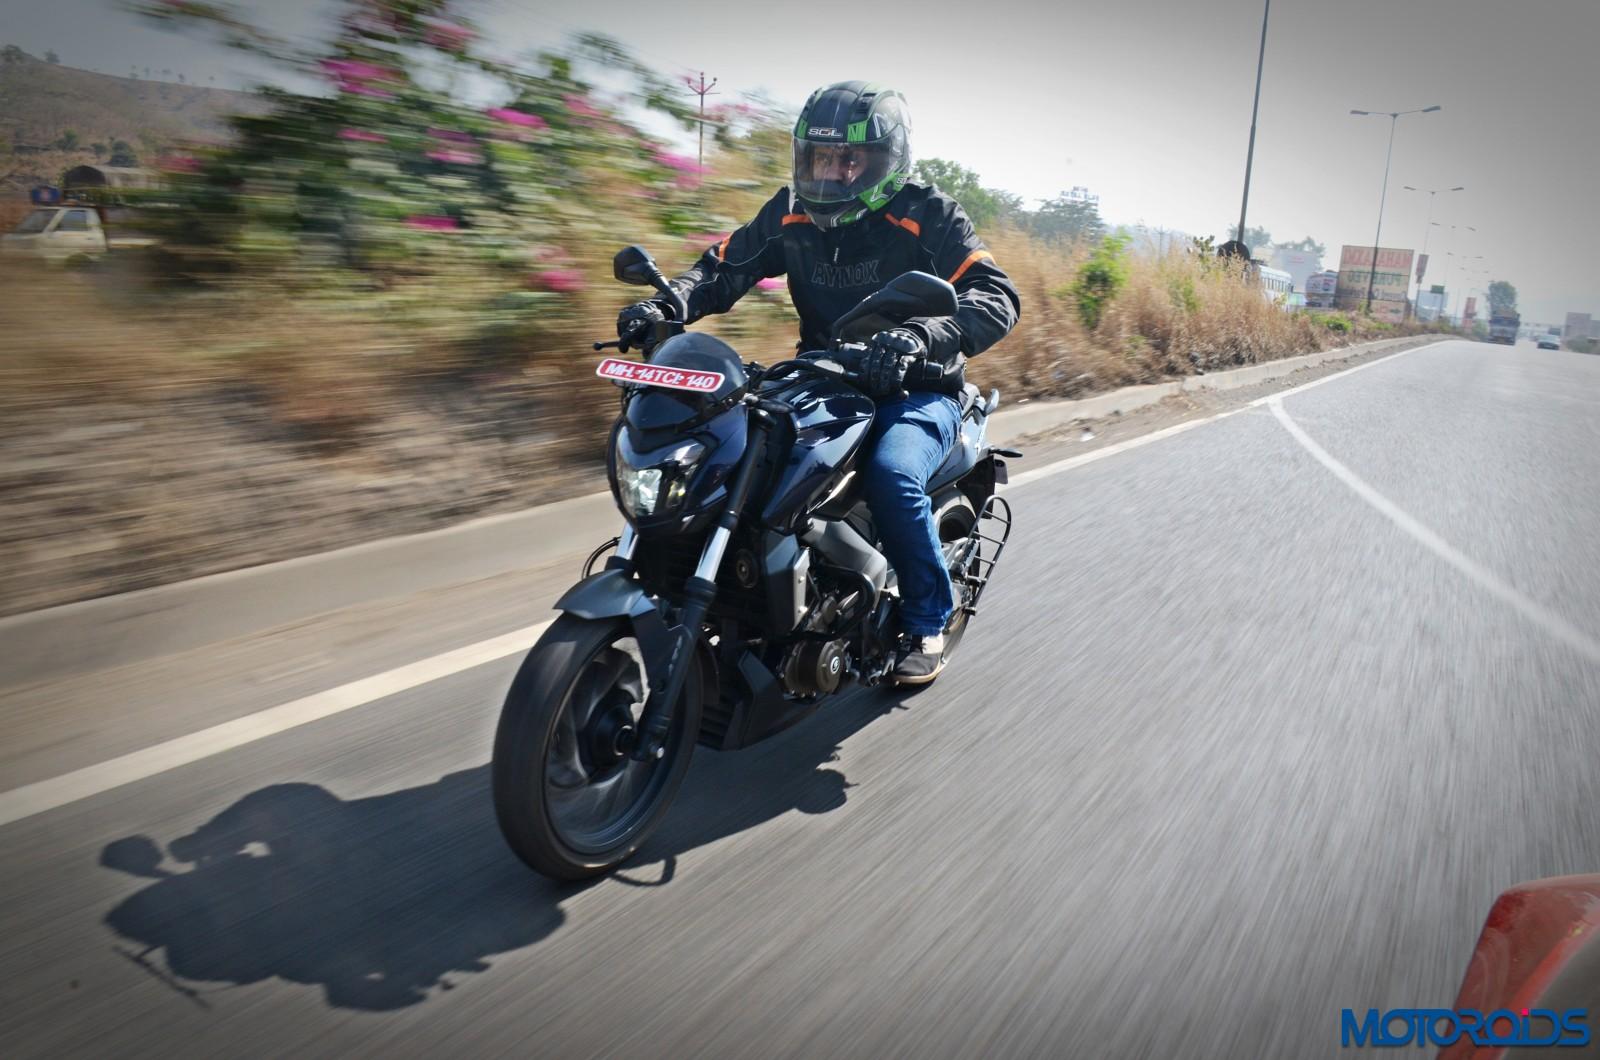 Bajaj Dominar 400 Gets Another Marginal Price Hike Motoroids